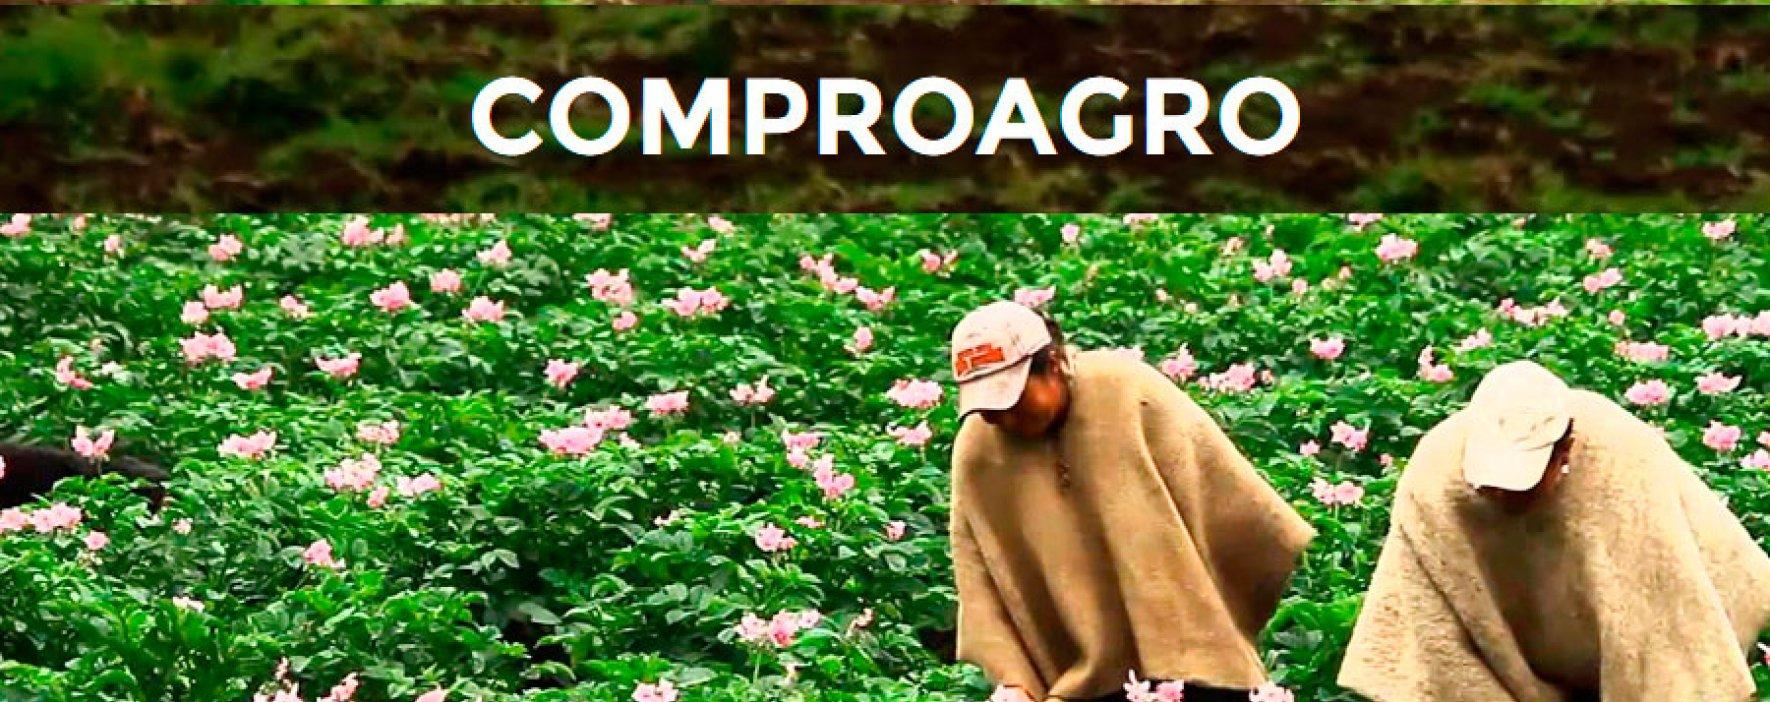 Comproagro: Iniciativa social de paz